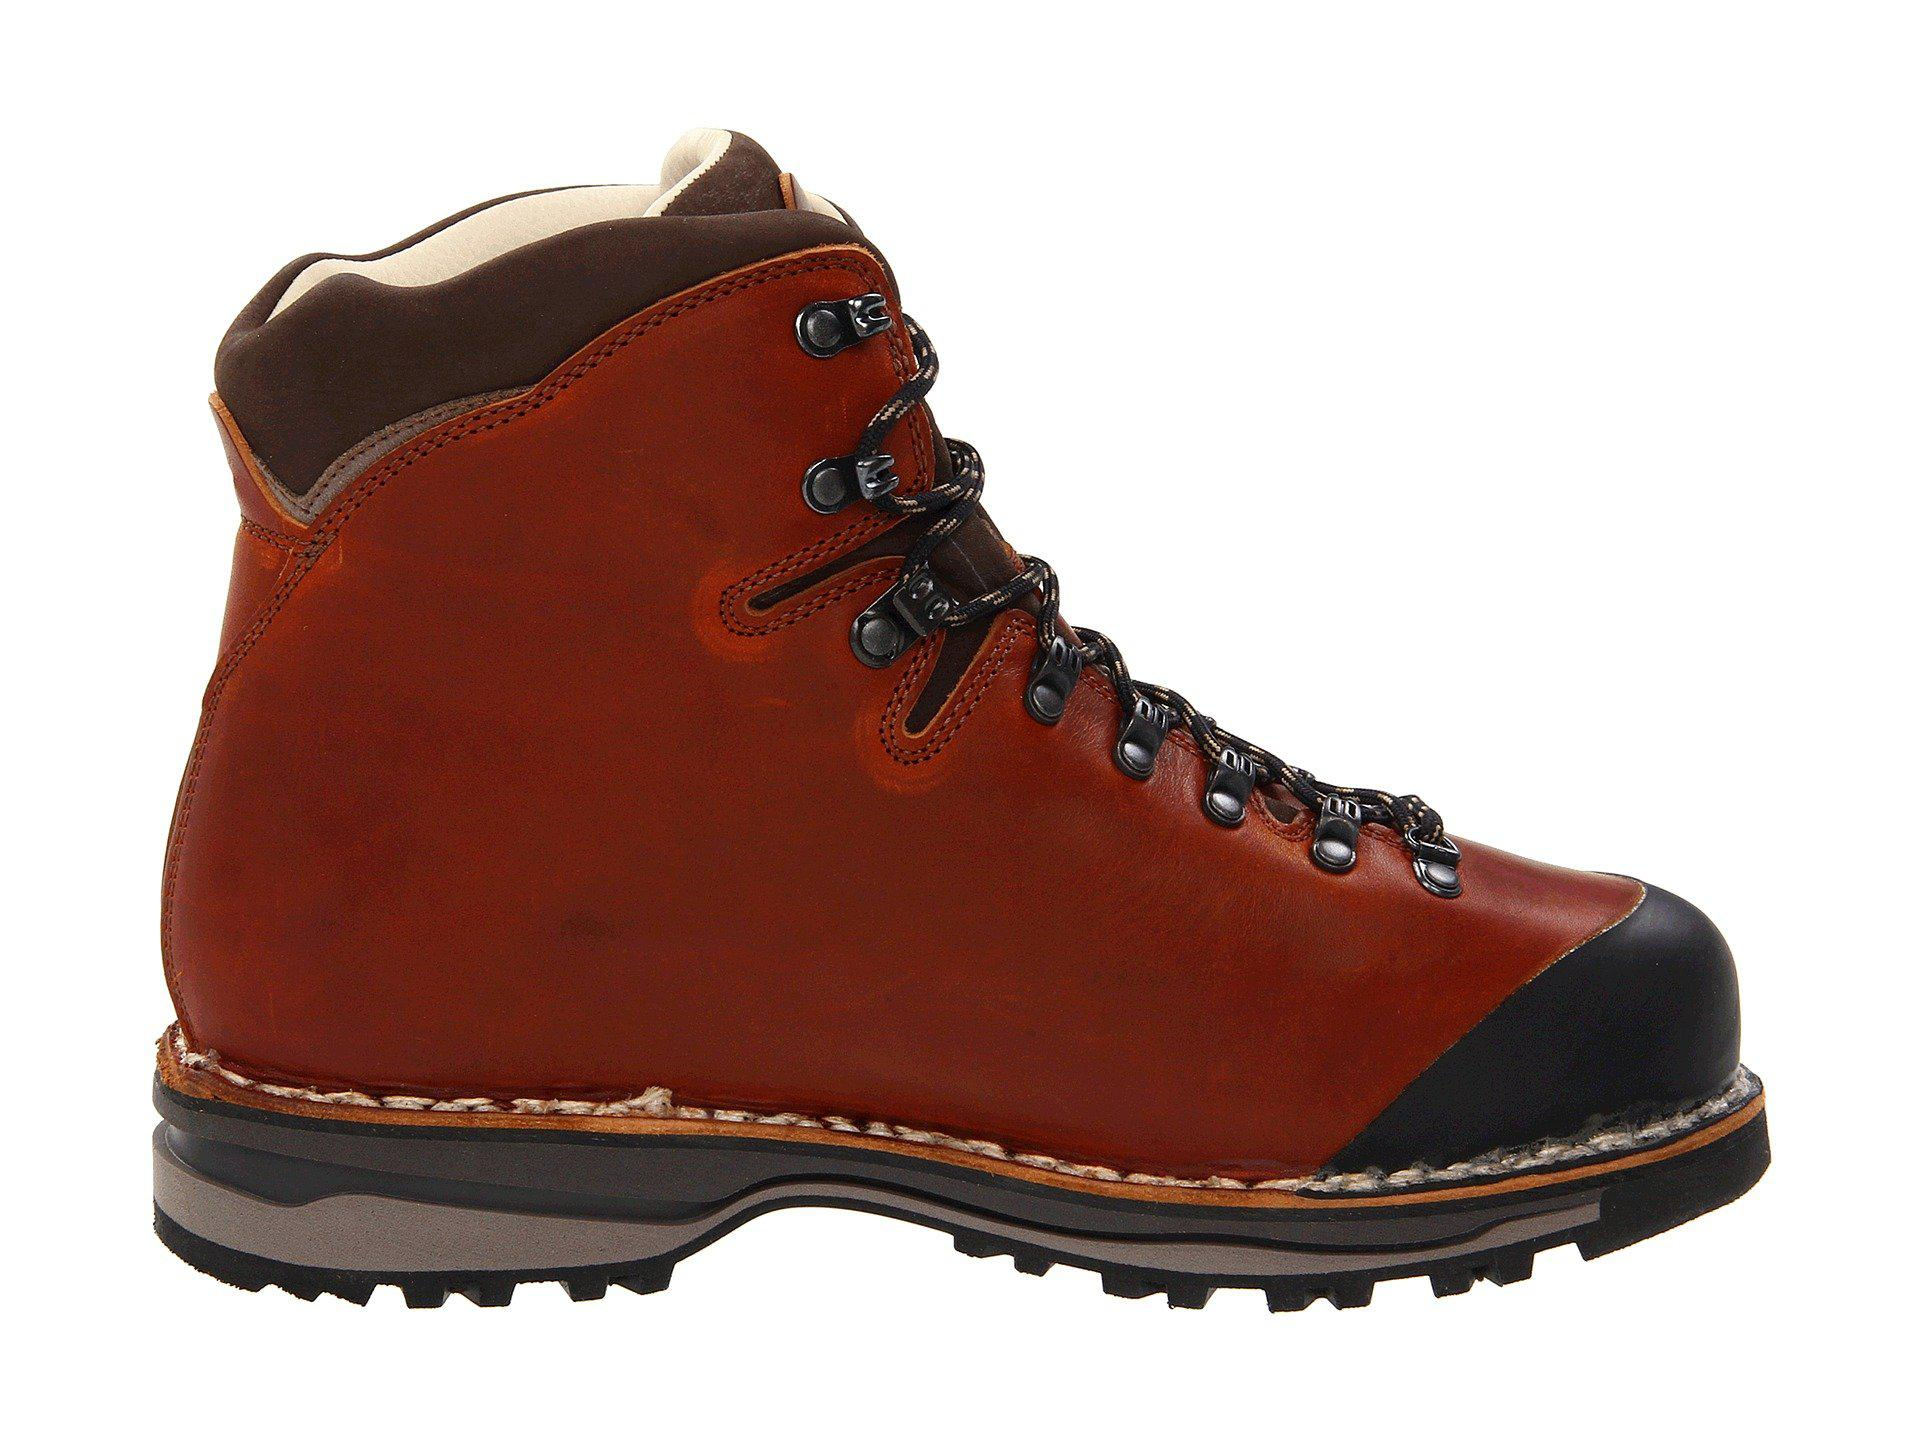 Zamberlan Leather Tofane Nw Gt Rr Waxed Brick Men S